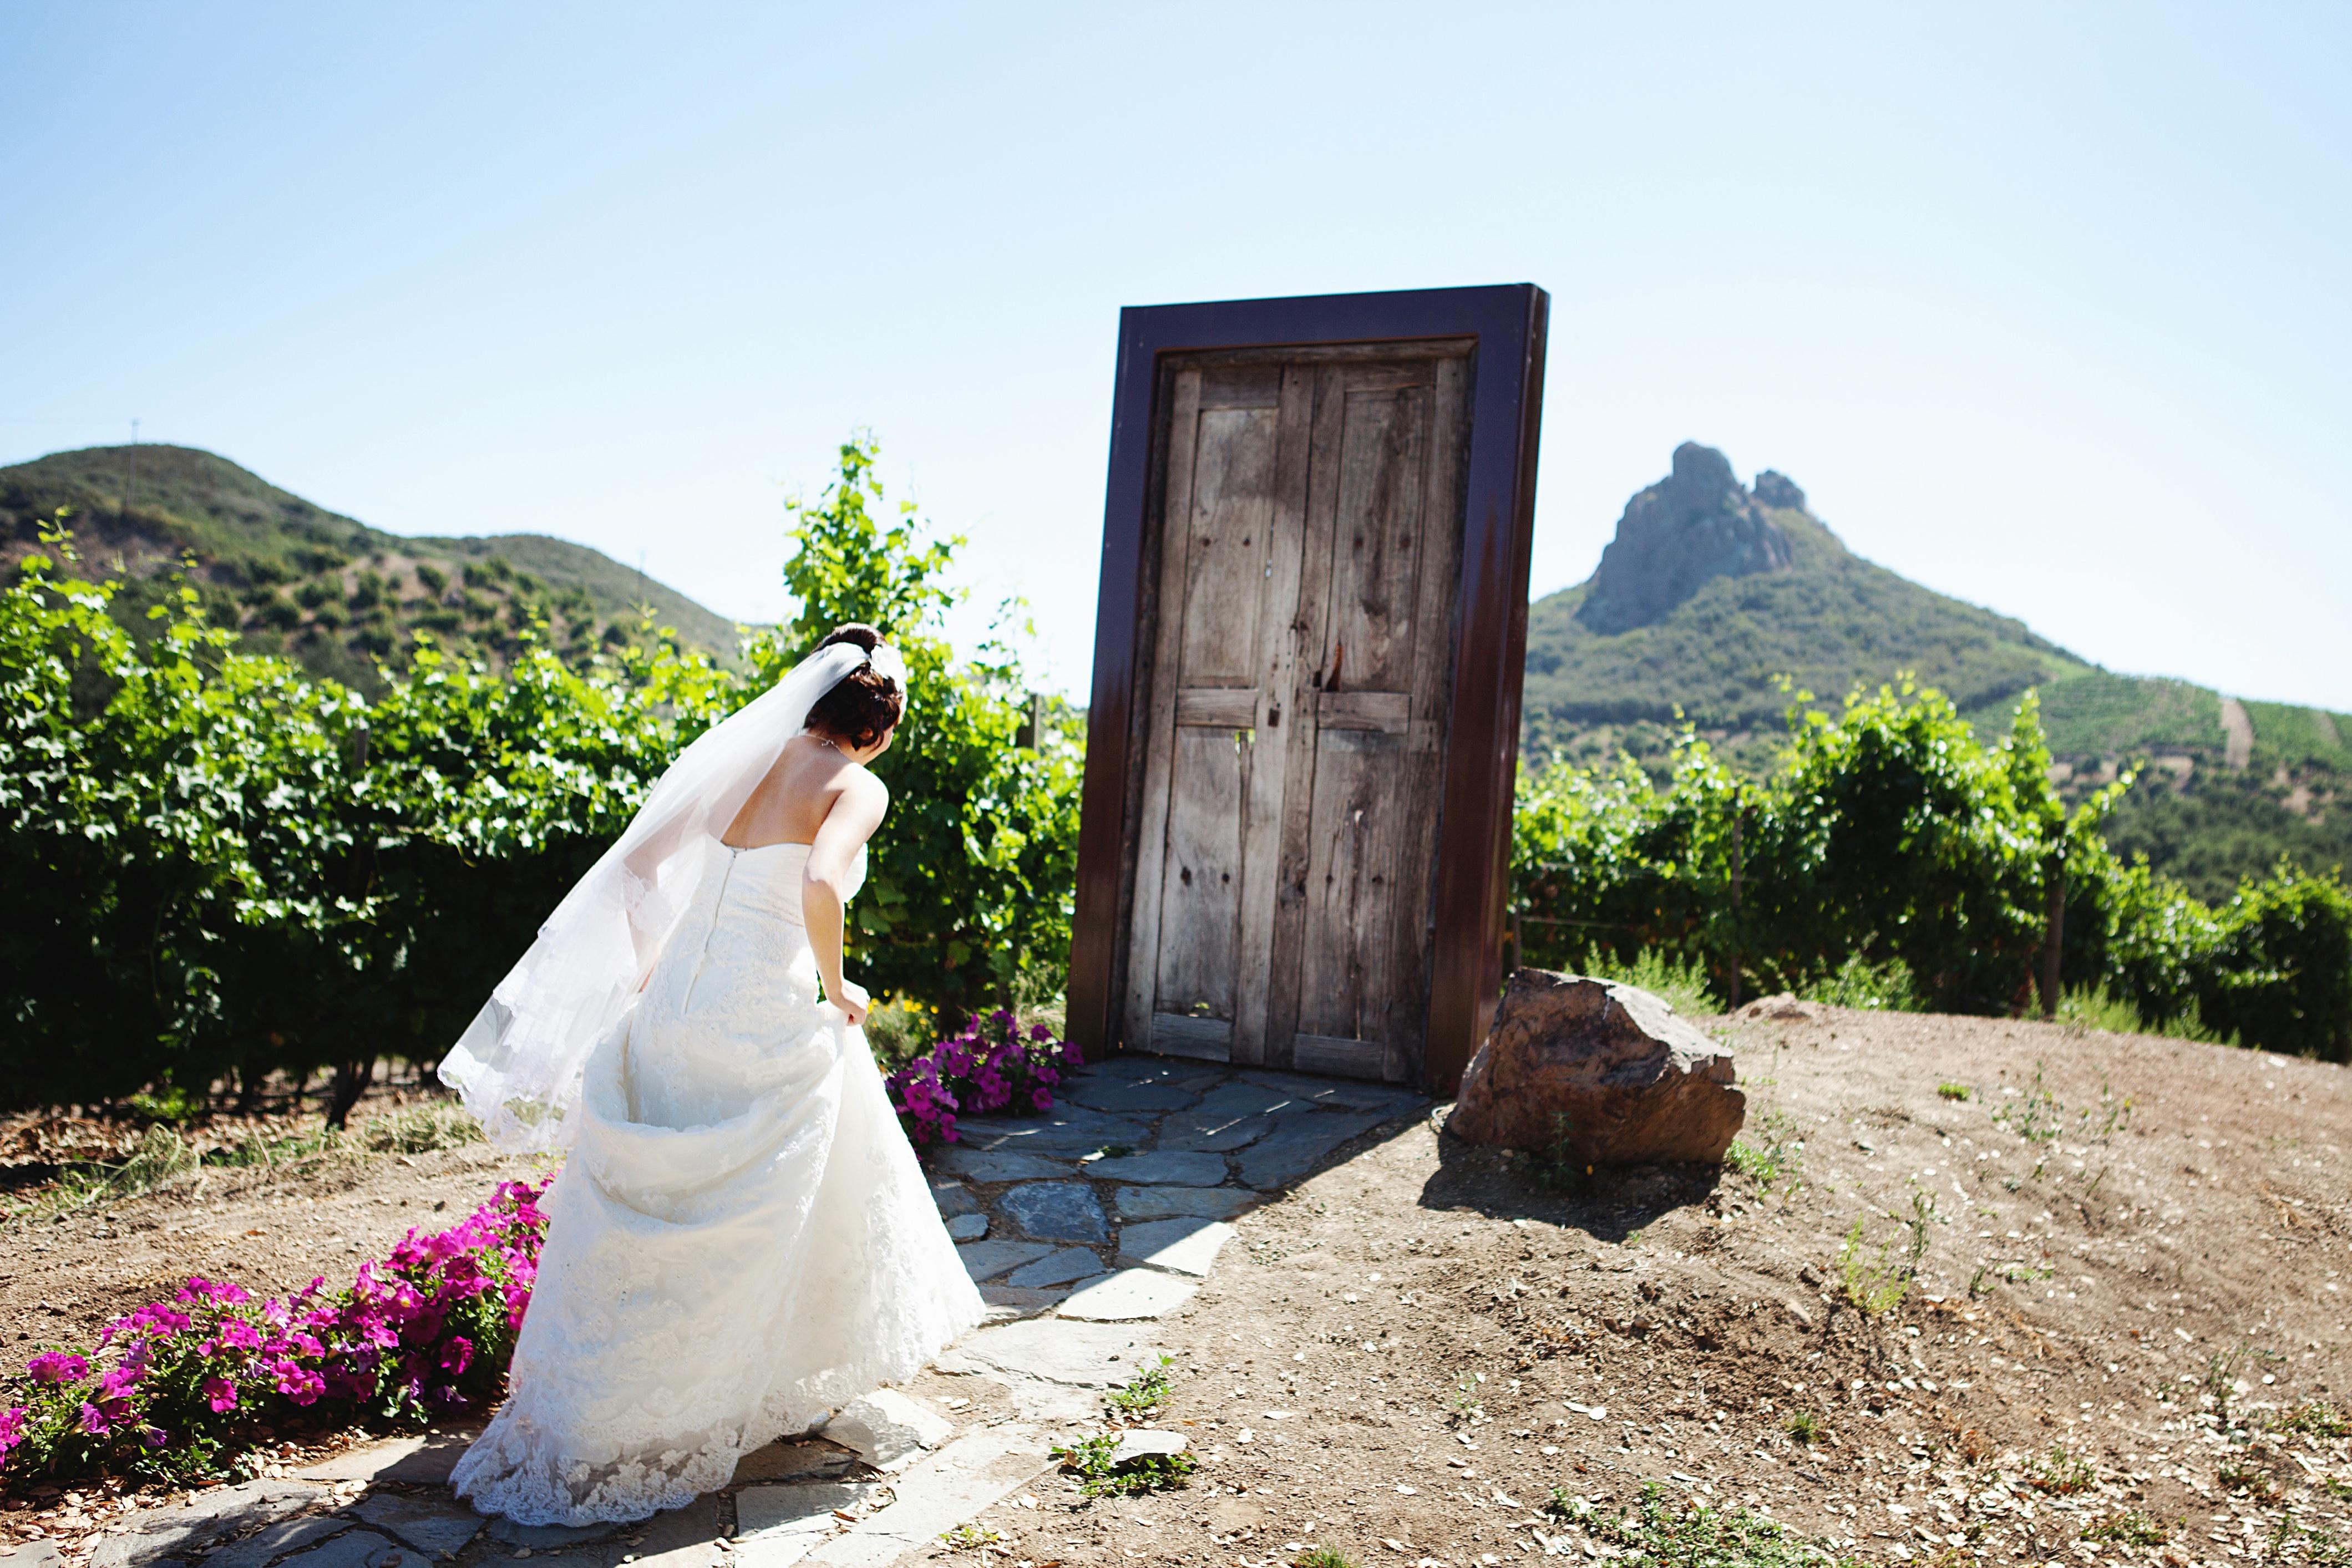 Creative First Look Wedding Photo Outdoor Weddings California 1